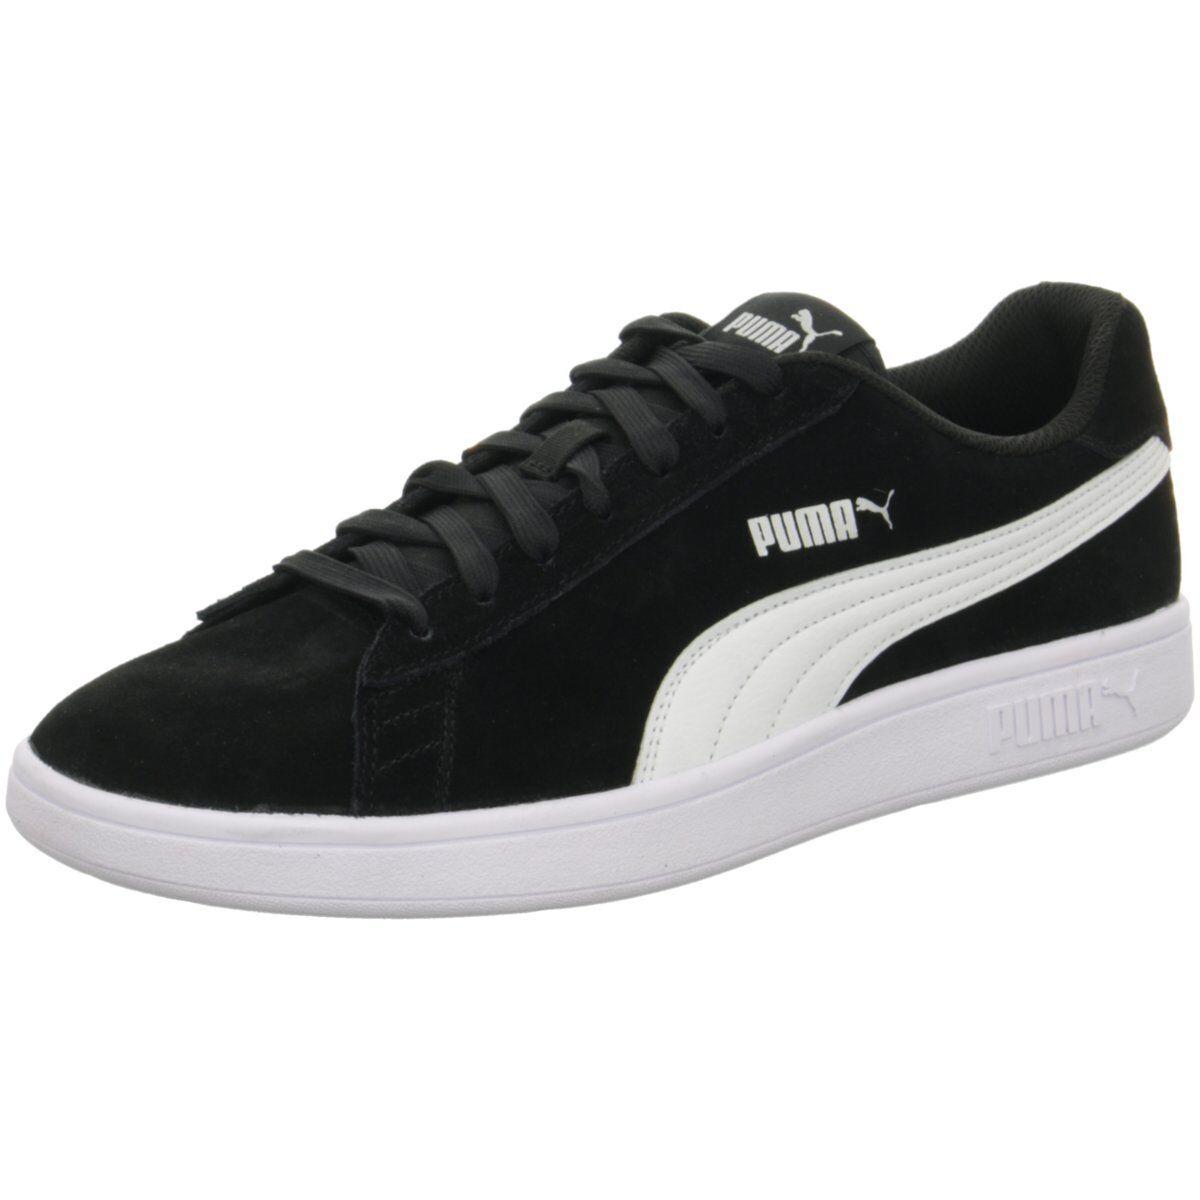 NEU Puma Herren Sneaker Puma Smash v2 364989-001-Smash-v2 schwarz 408440